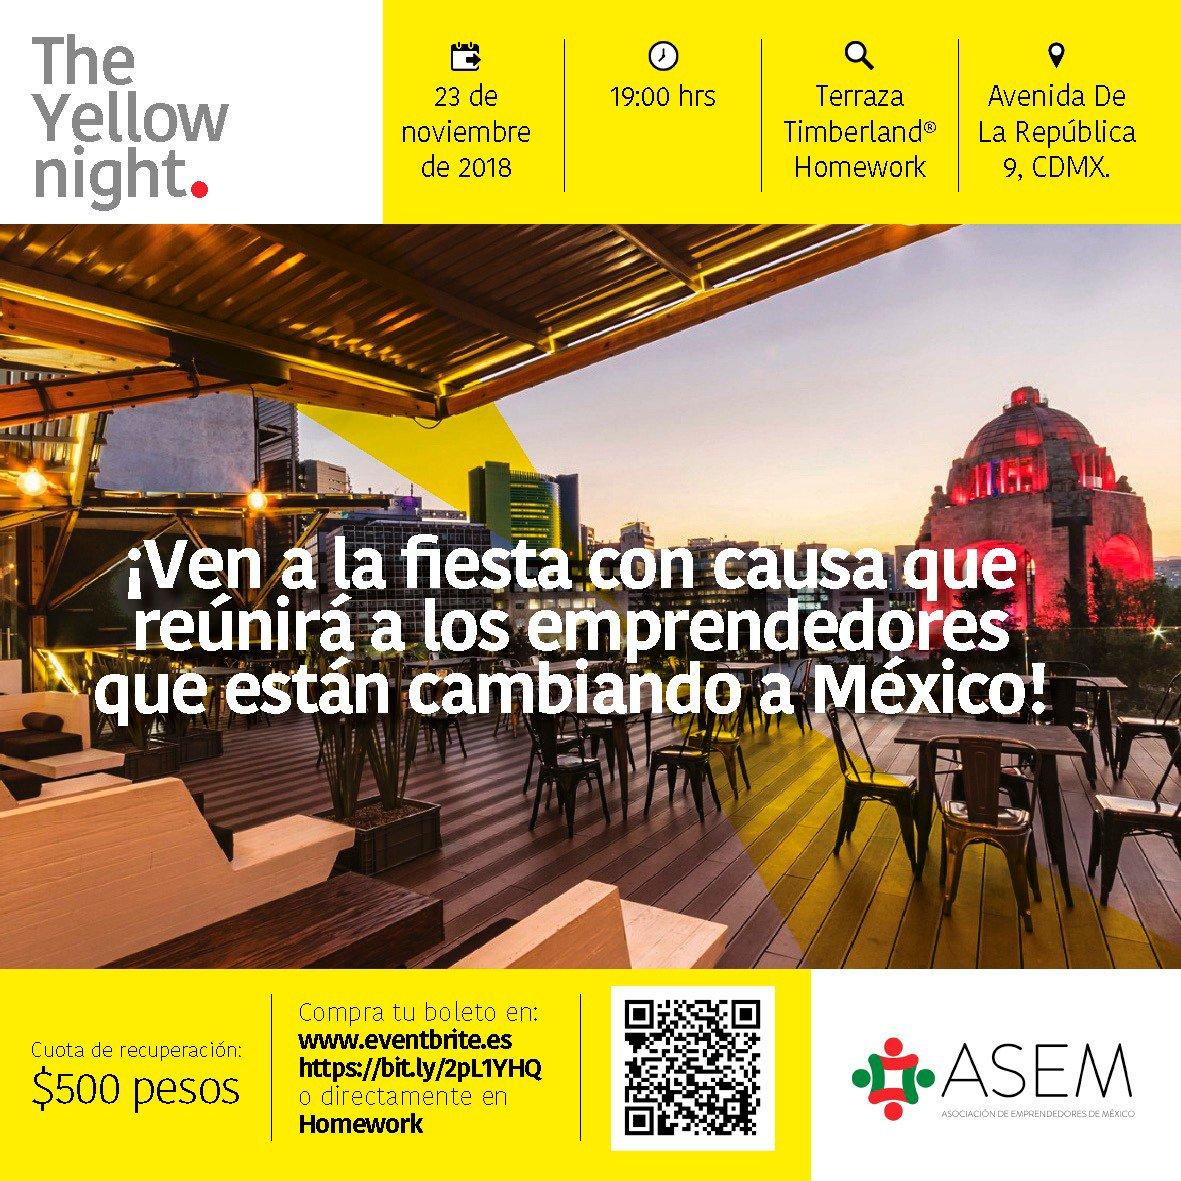 Homework México 1 Cdmx 2019 On Twitter Si Les Gustó Lo